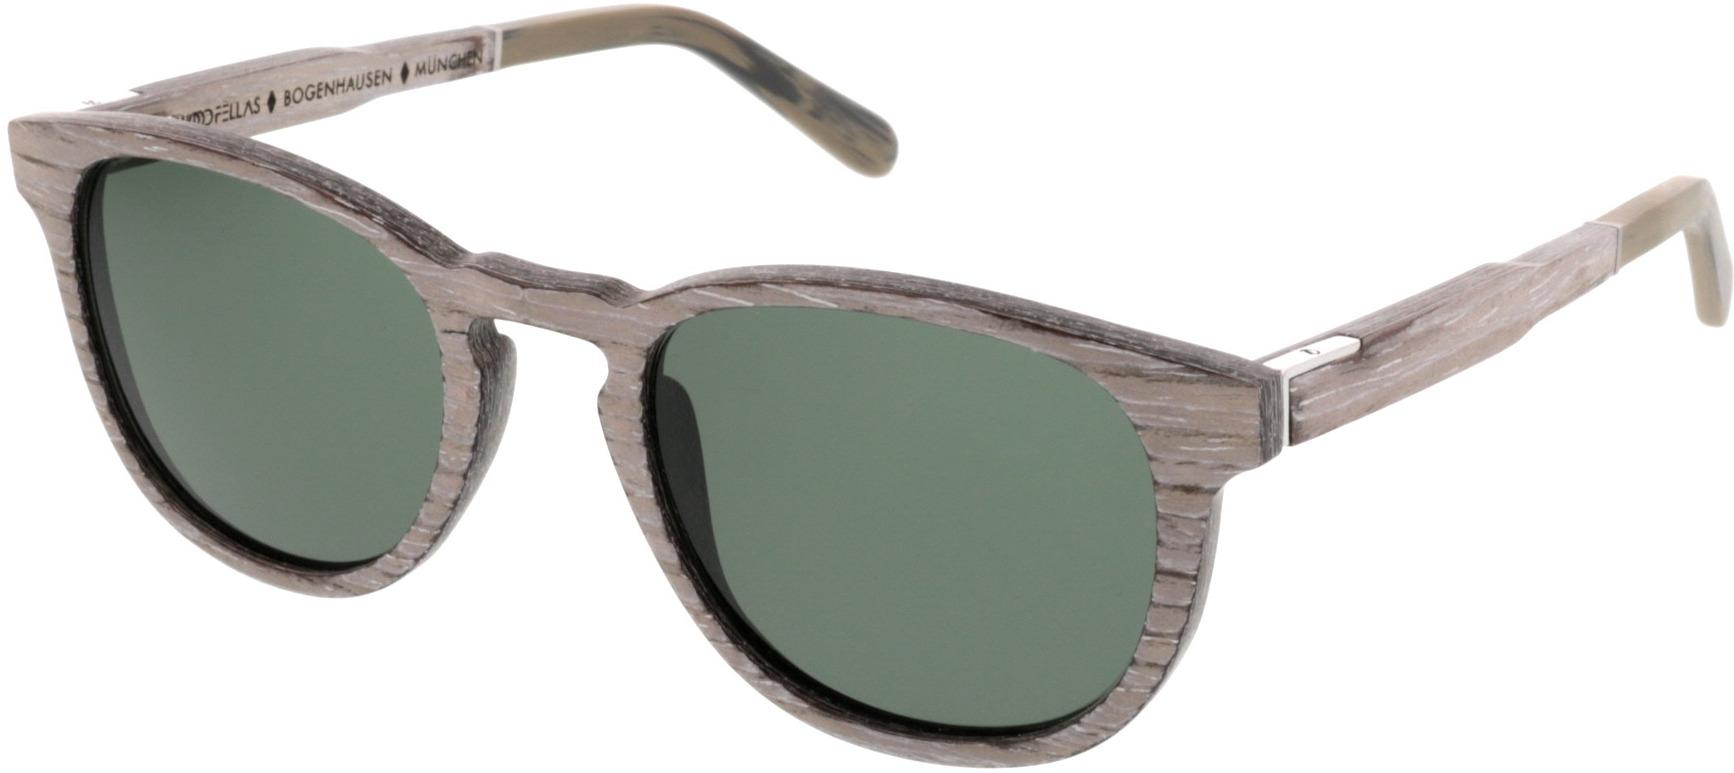 Picture of glasses model Wood Fellas Sunglasses Bogenhausen chalk oak 49-21 in angle 330